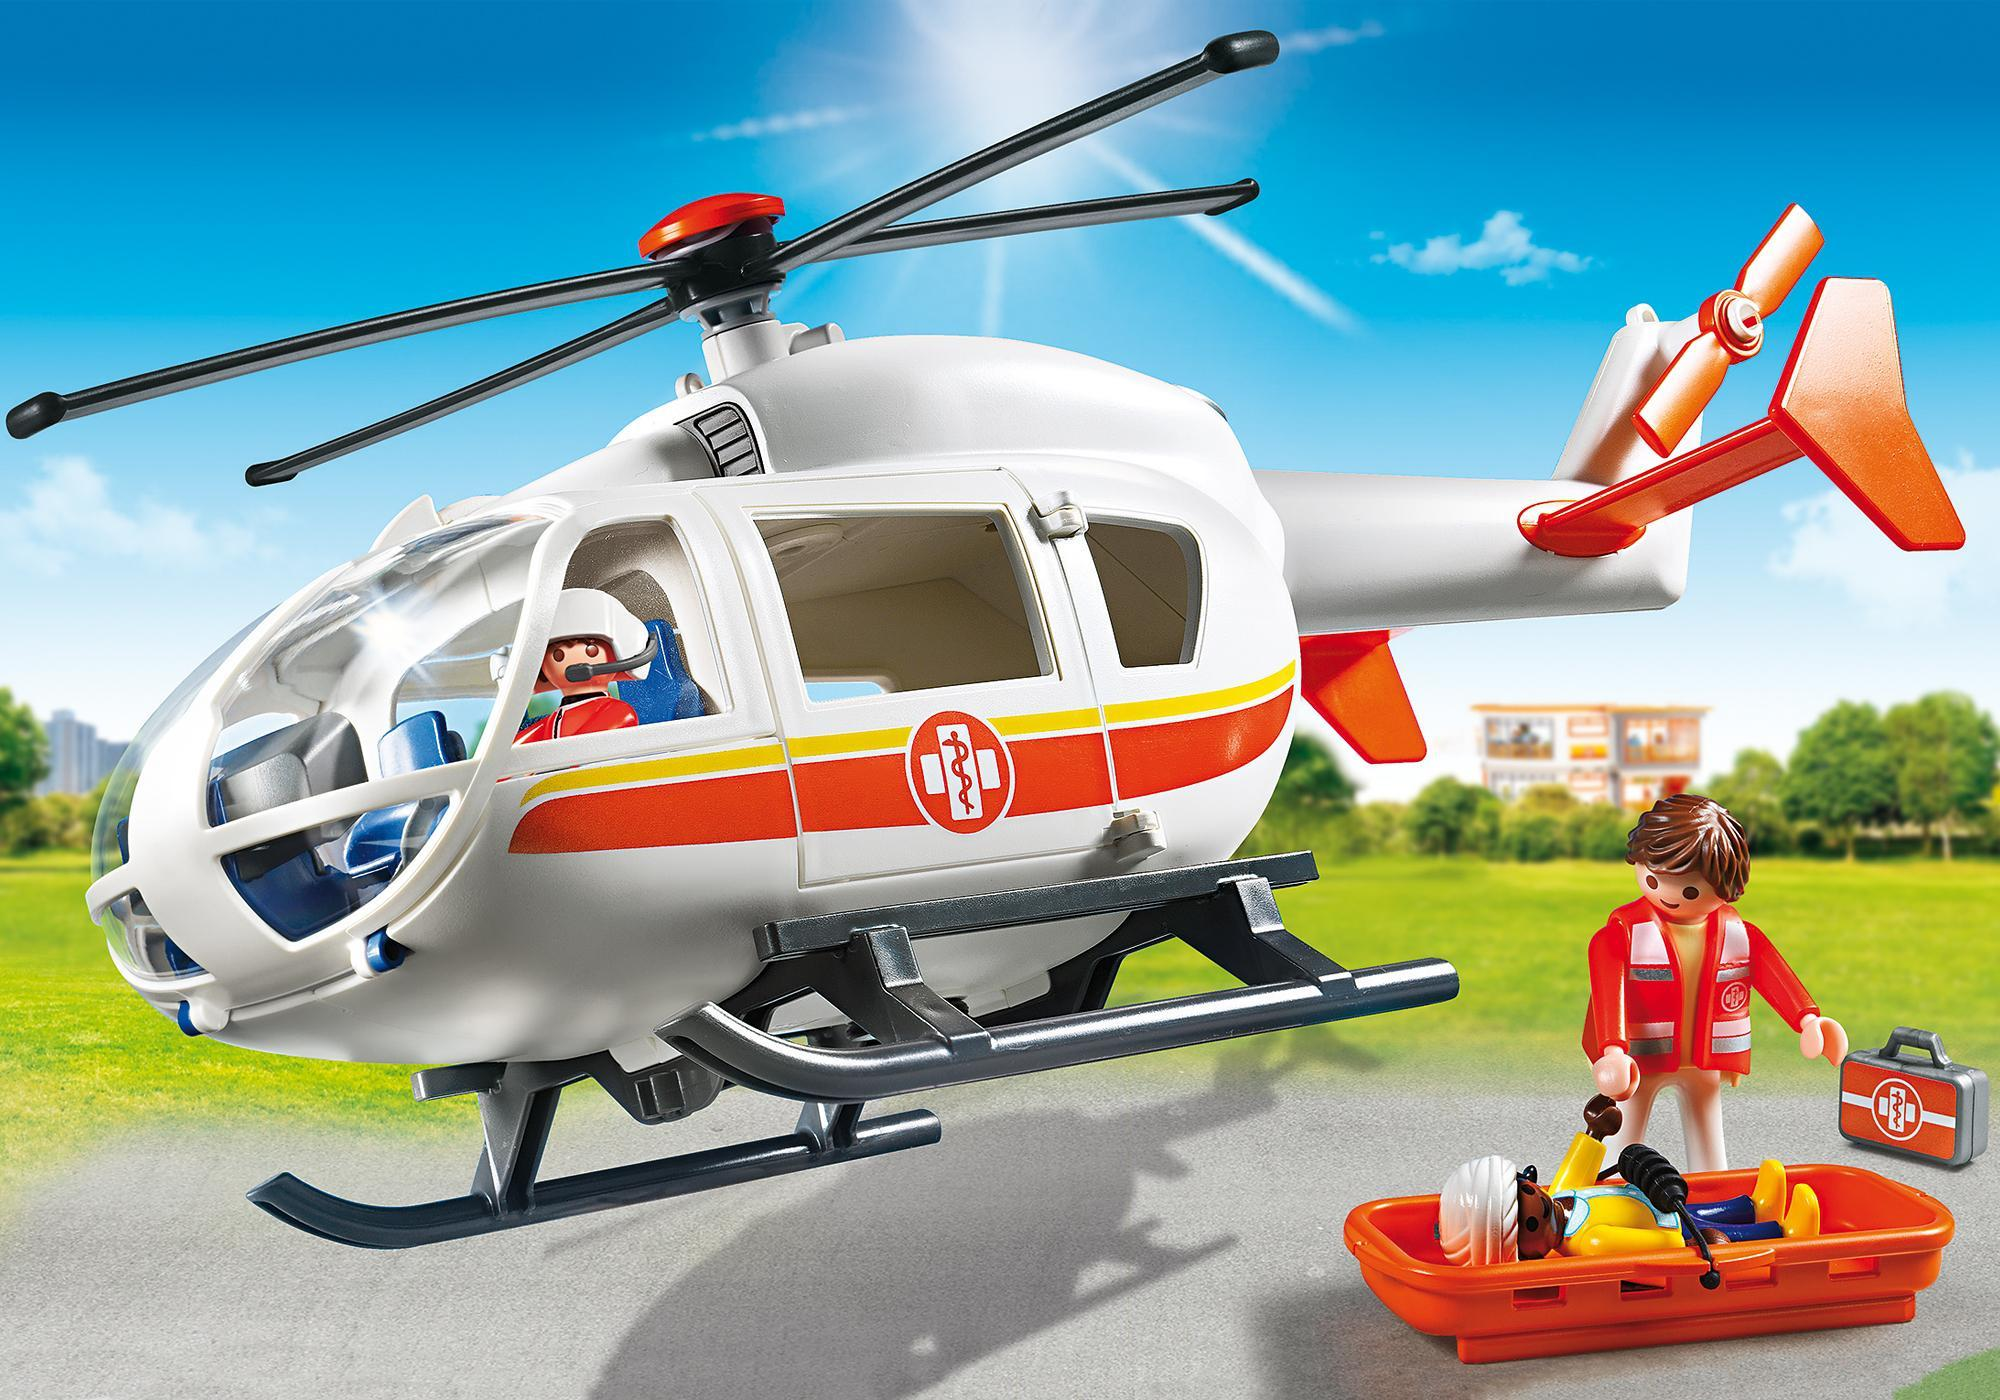 http://media.playmobil.com/i/playmobil/6686_product_detail/Hélicoptère médical